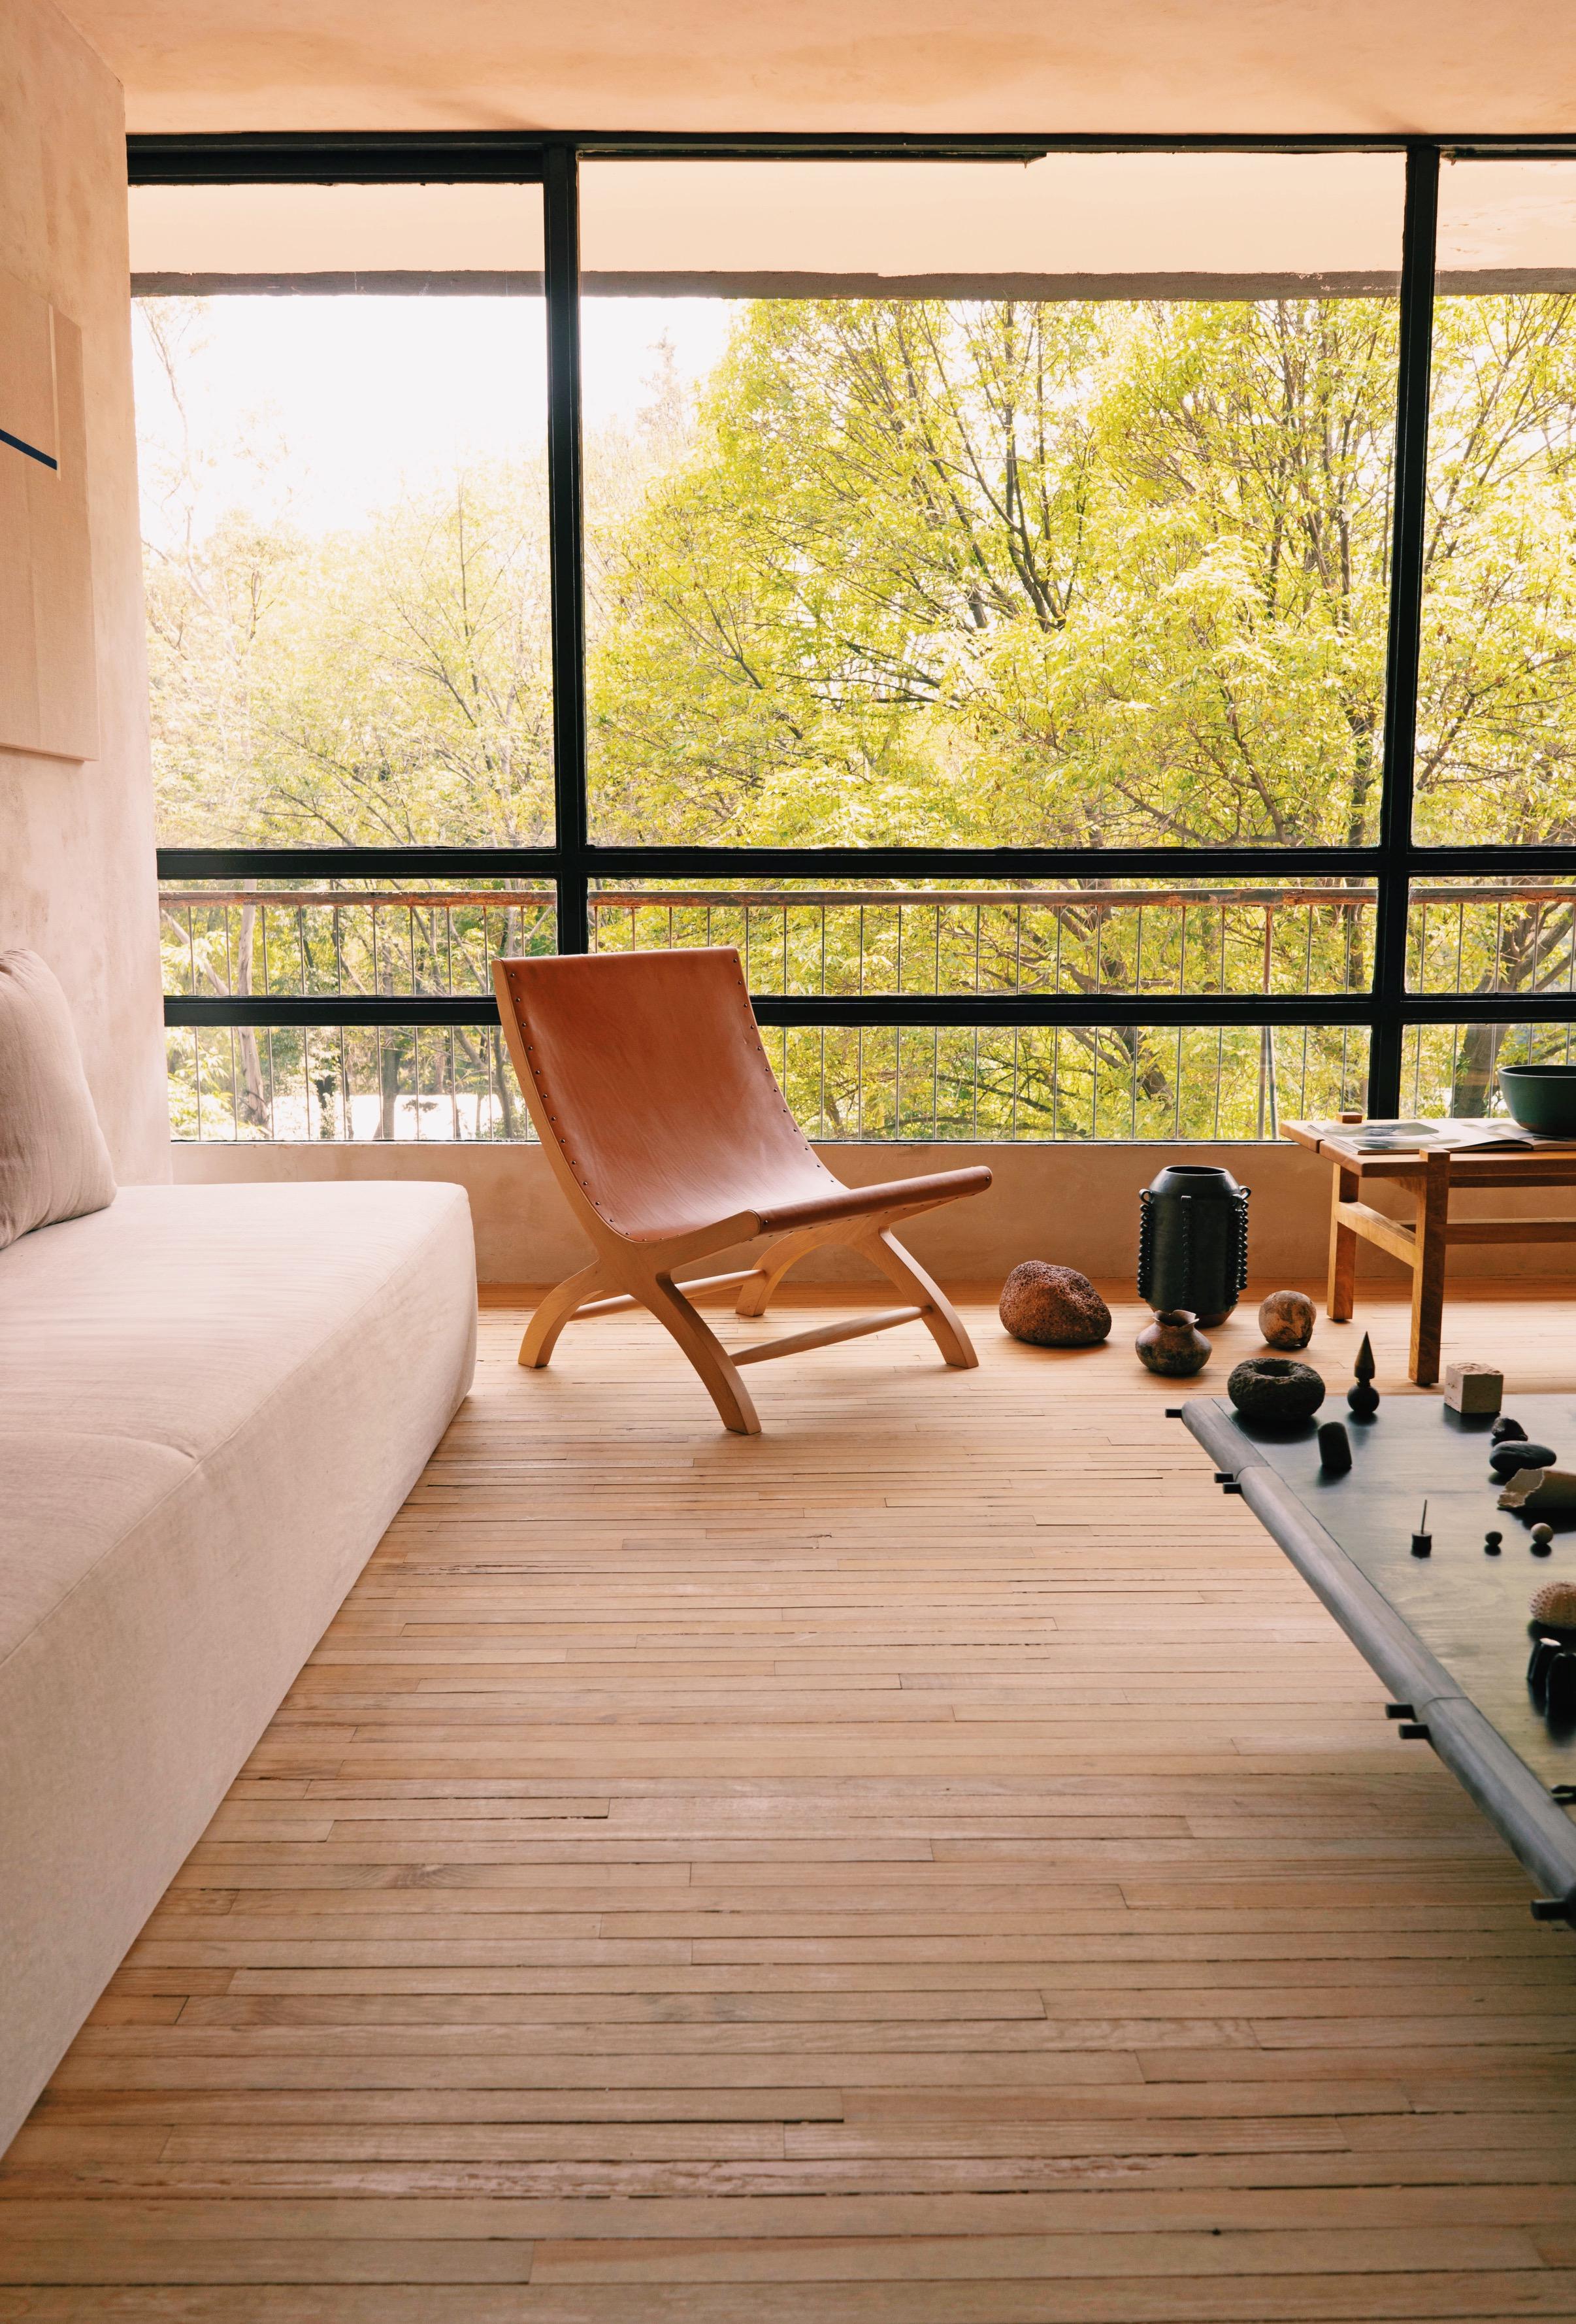 Luteca-CP-Butaque_Lounge_Chair-Natural_Hide-Birch_Wood_W.JPG